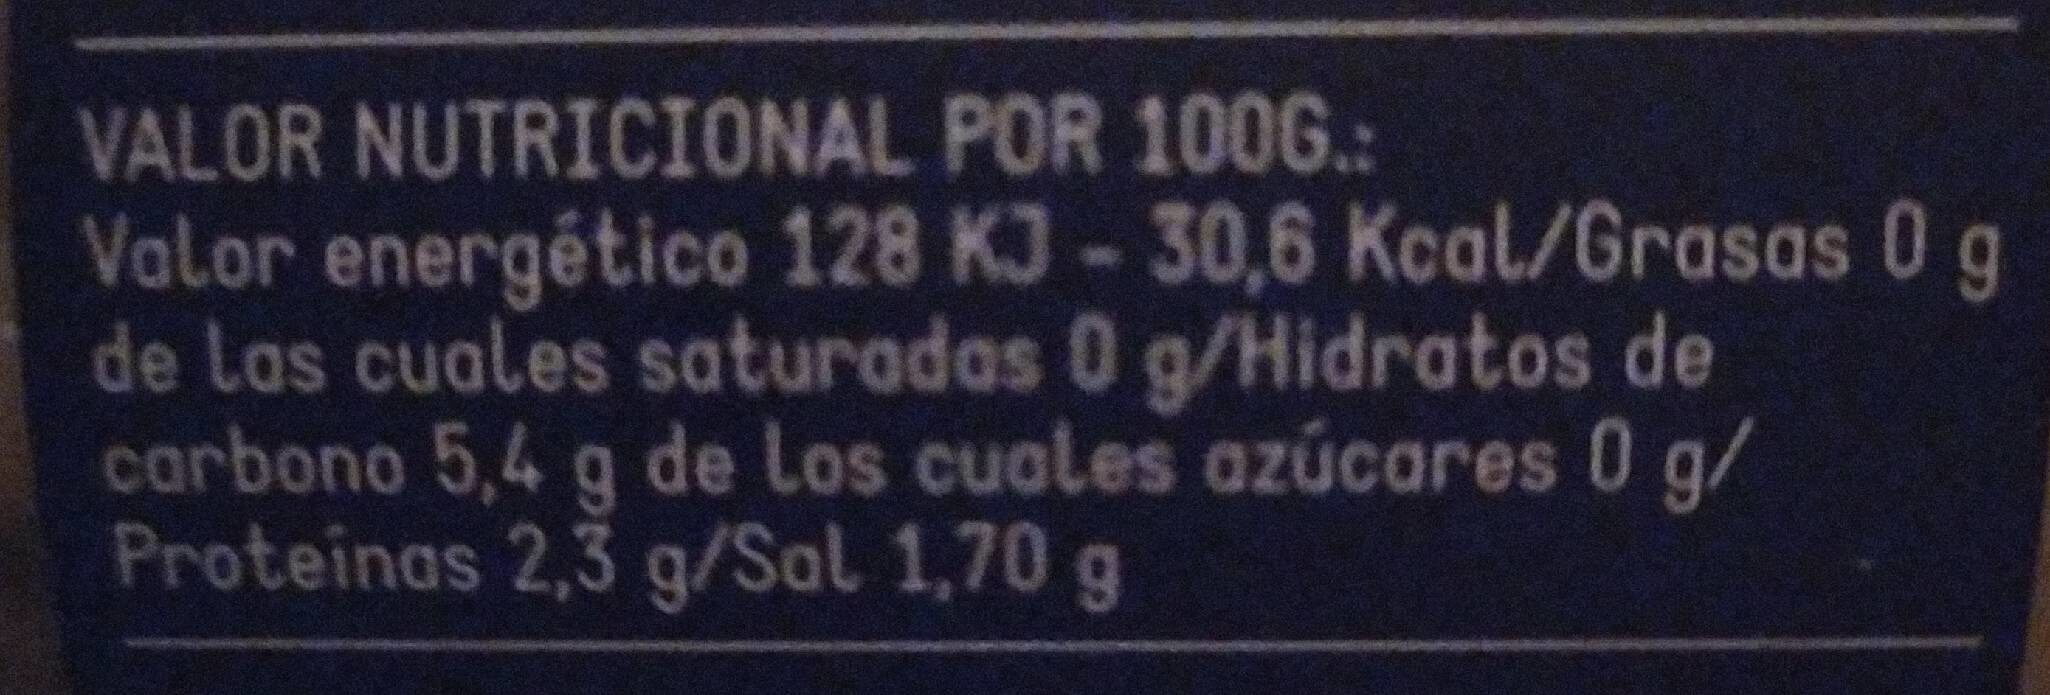 Alubia verde primera - Nutrition facts